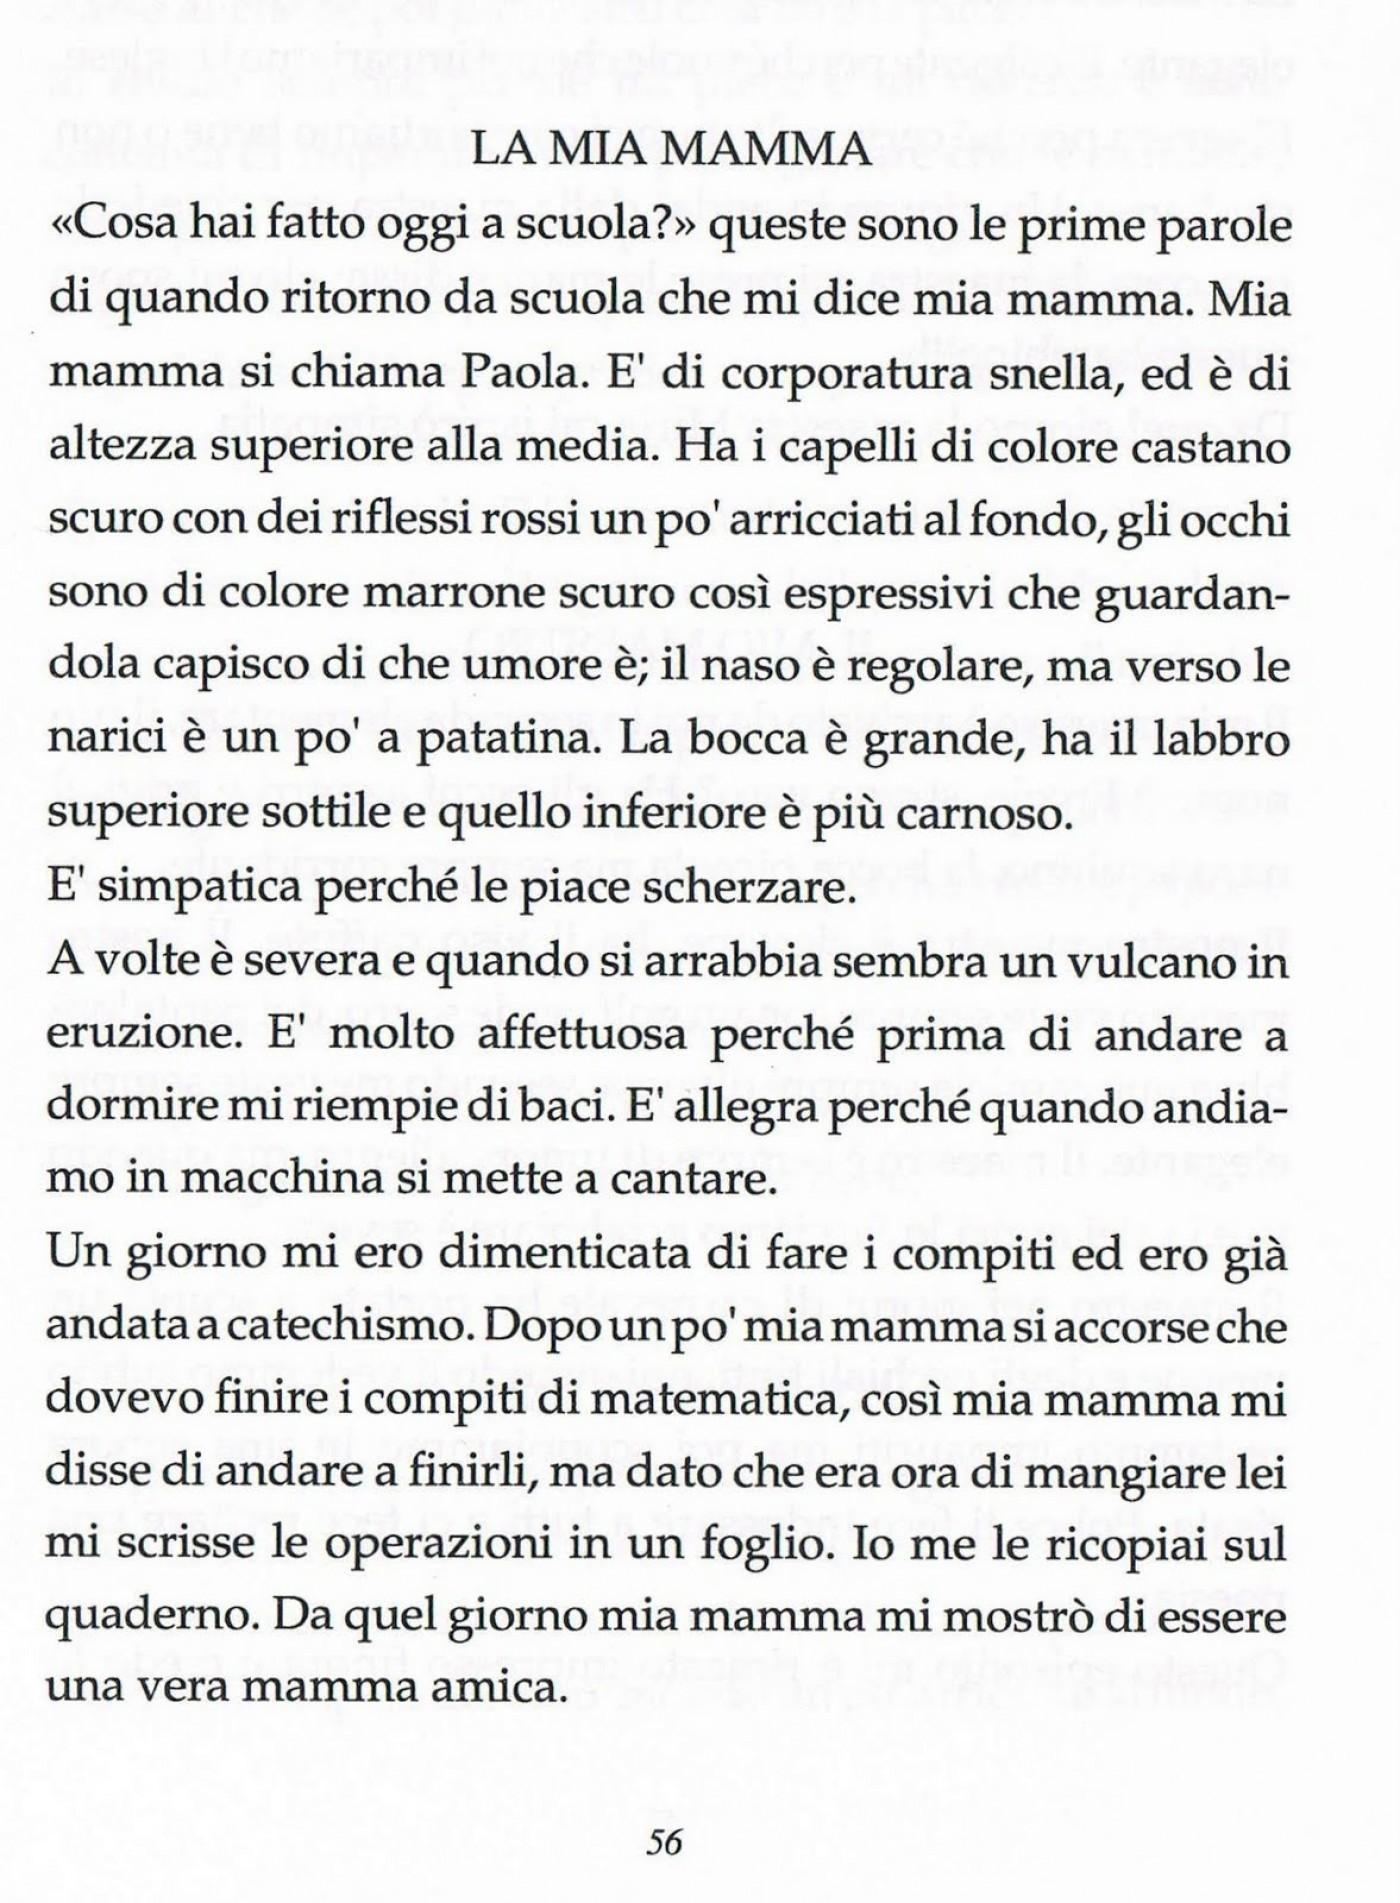 009 Argumentative Essay Euthanasia Academic Argument Example Testo Writing Stirring Pdf Introduction Outline 1400